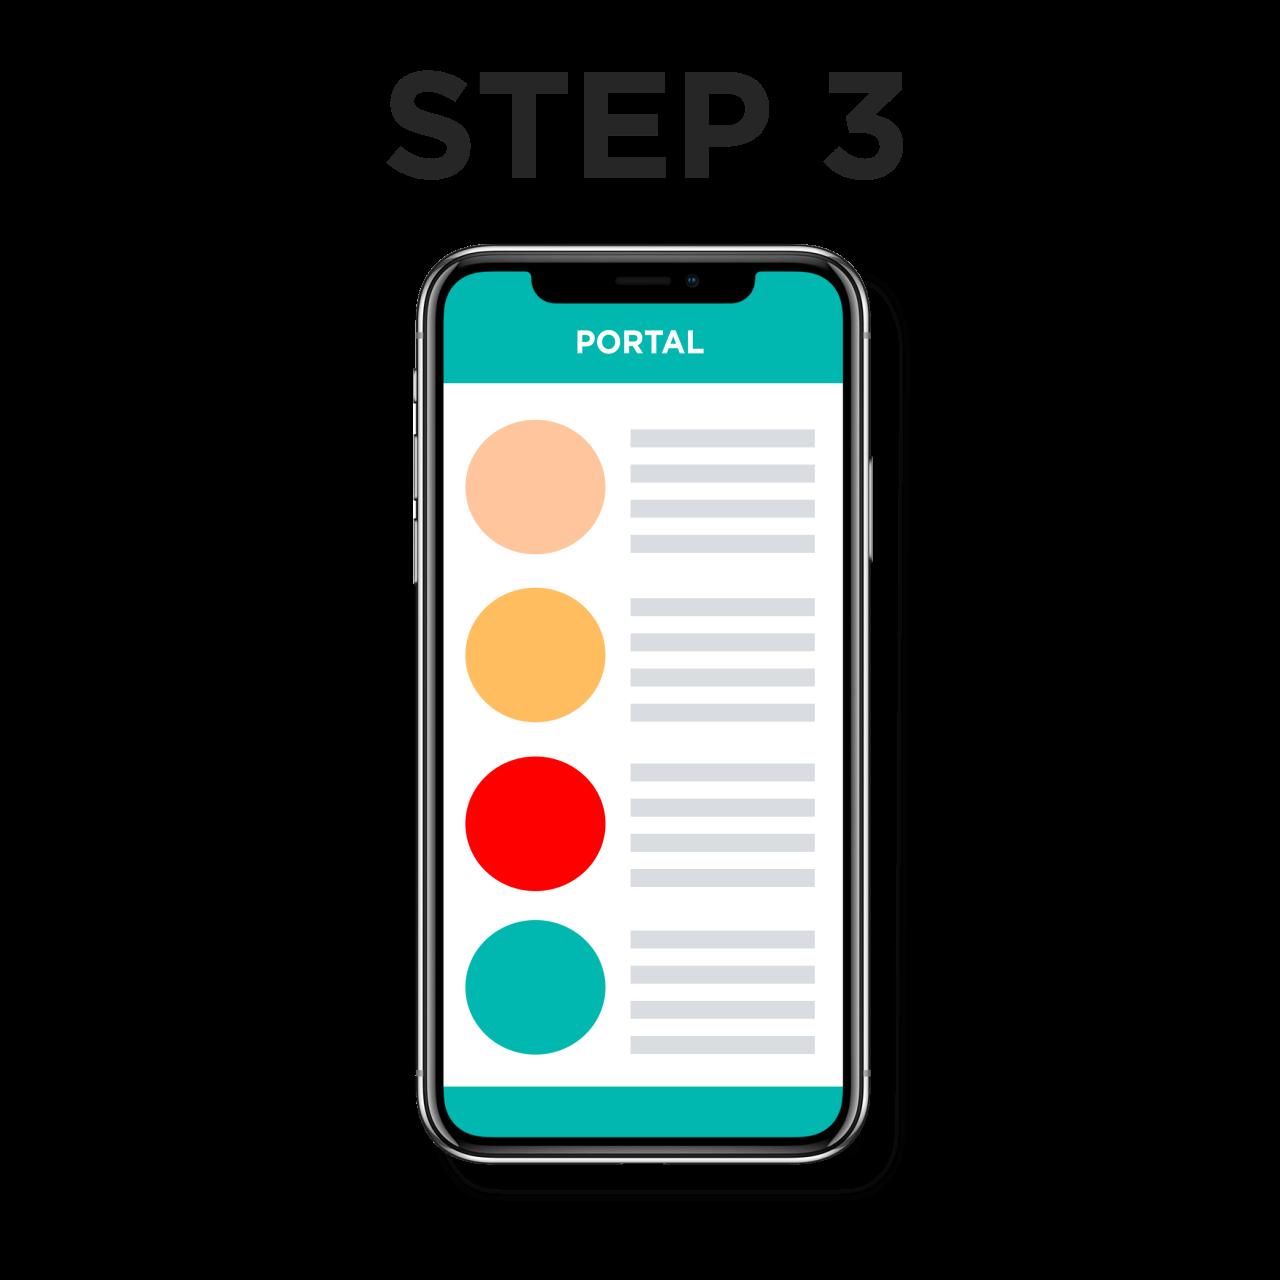 KeyToPortal Authenticator Step 3